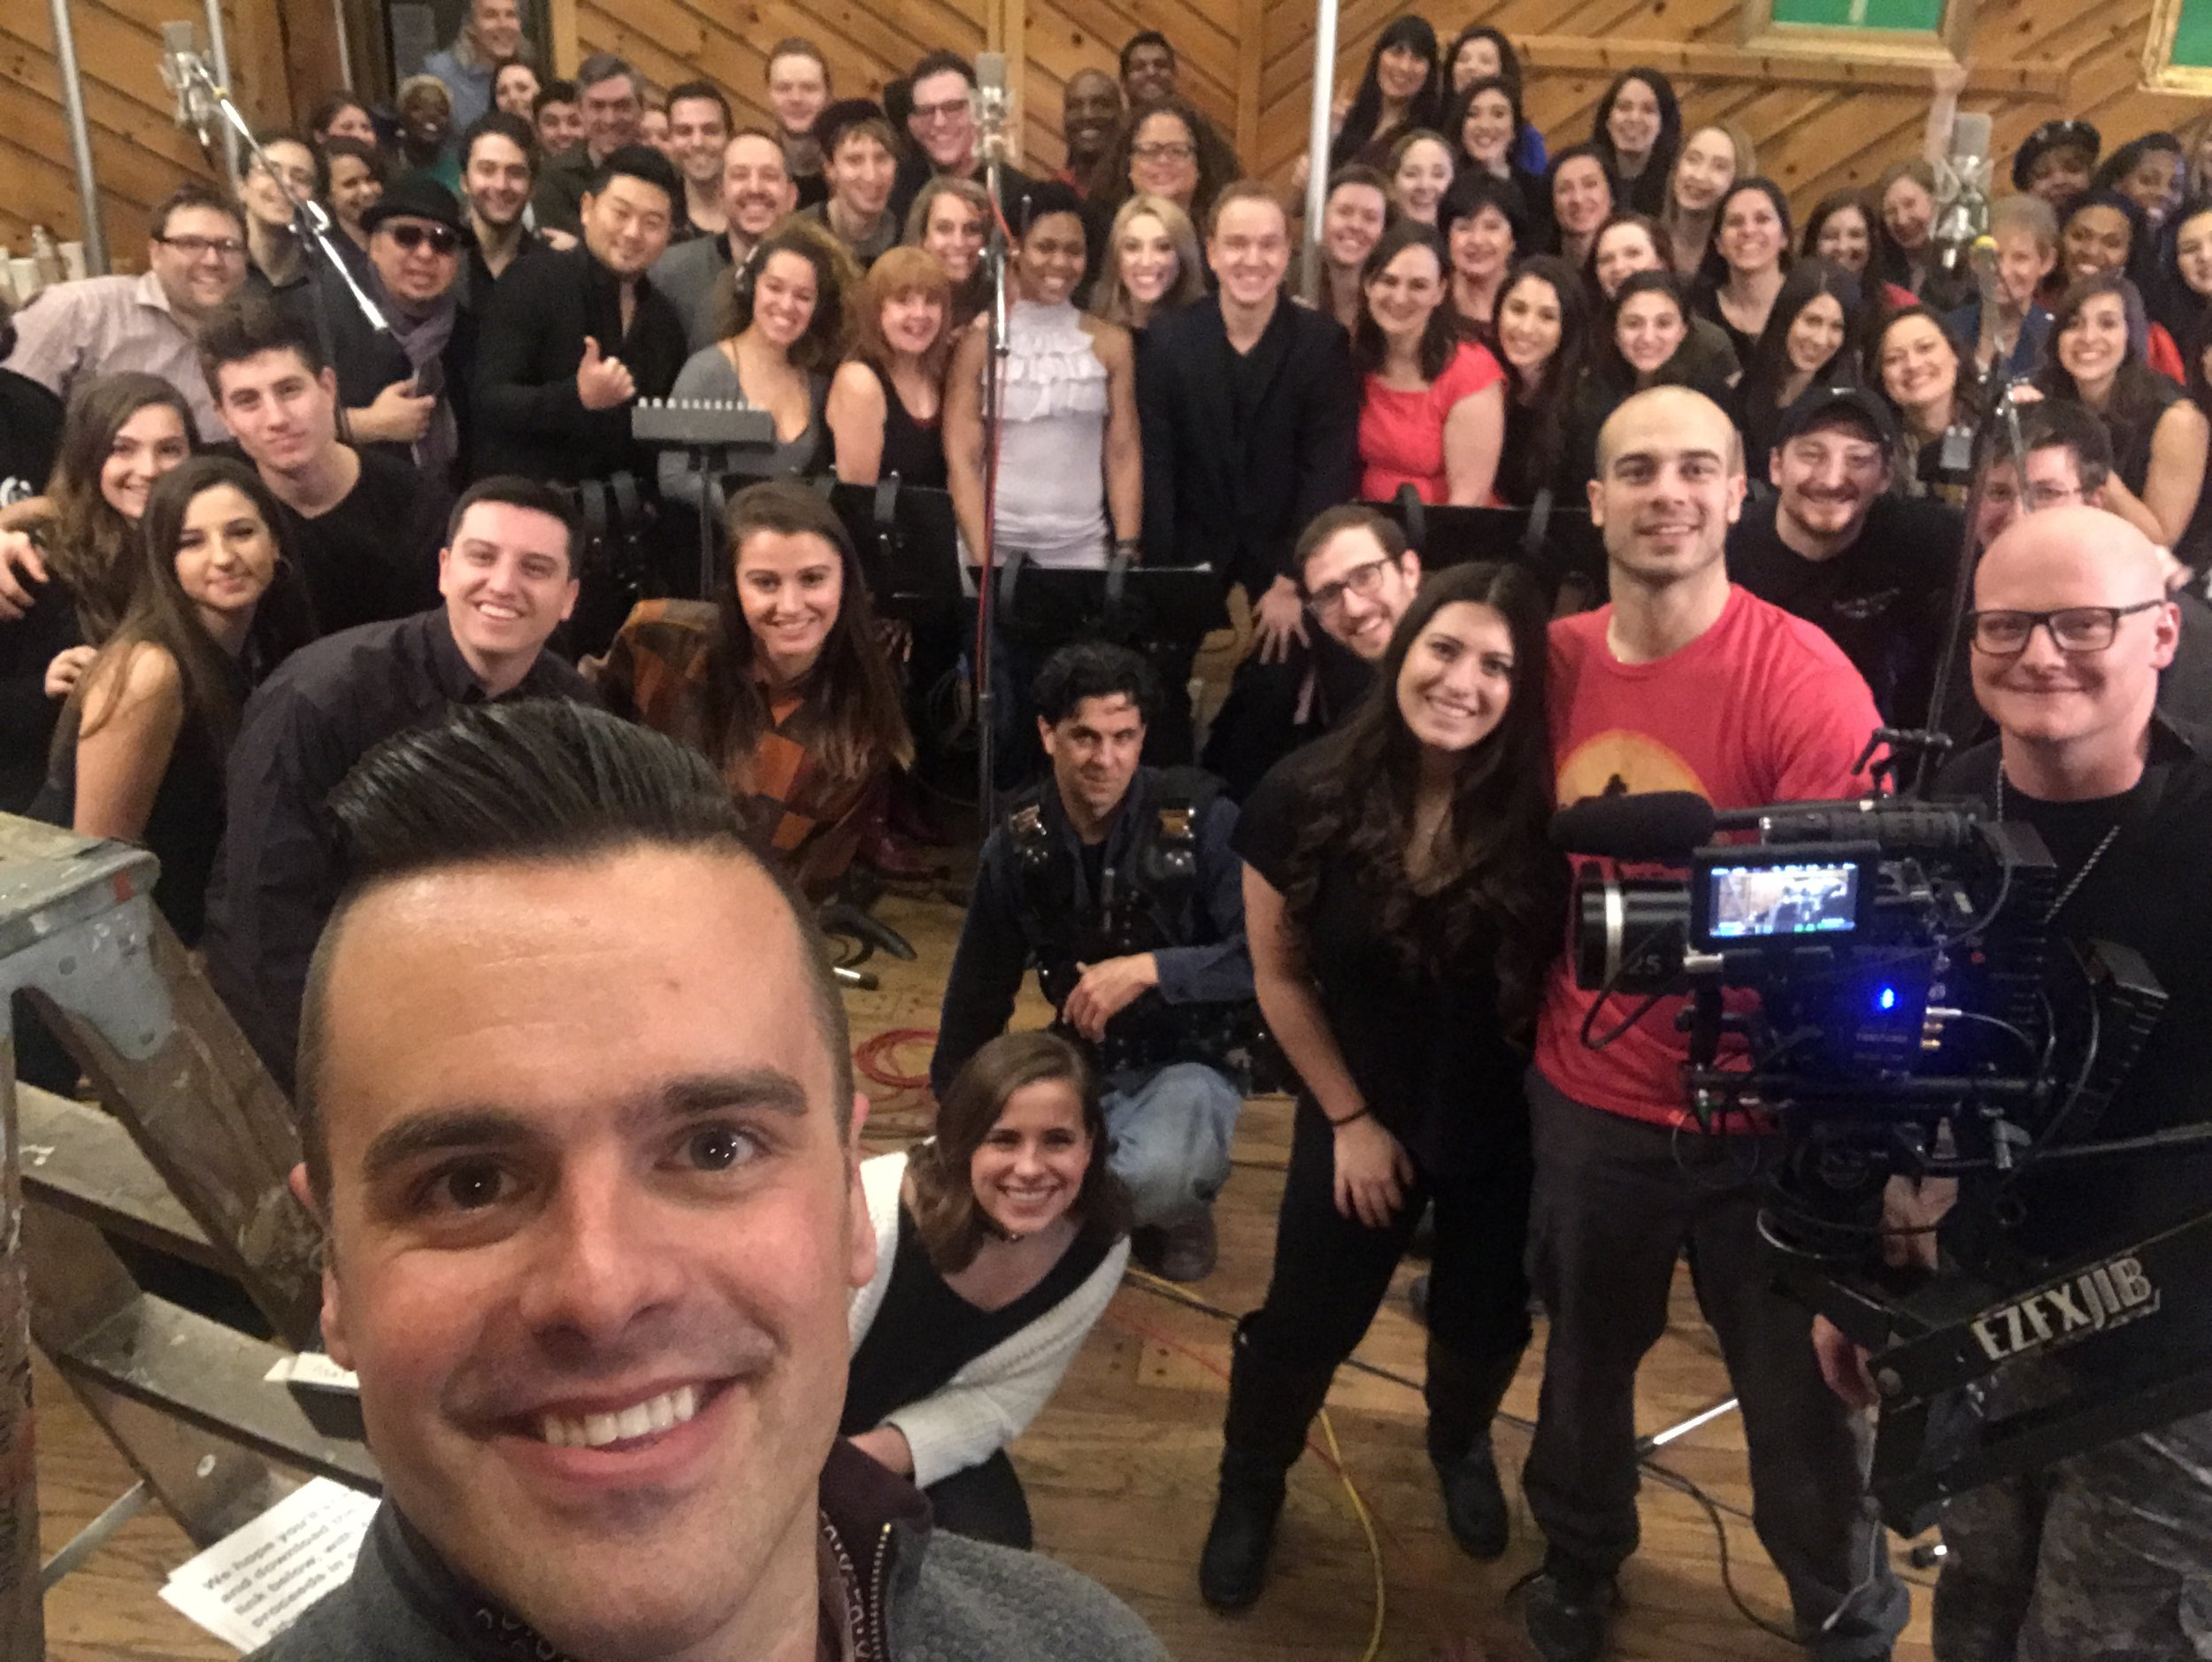 Michael J Moritz Jr with the #savetheNEA chorus